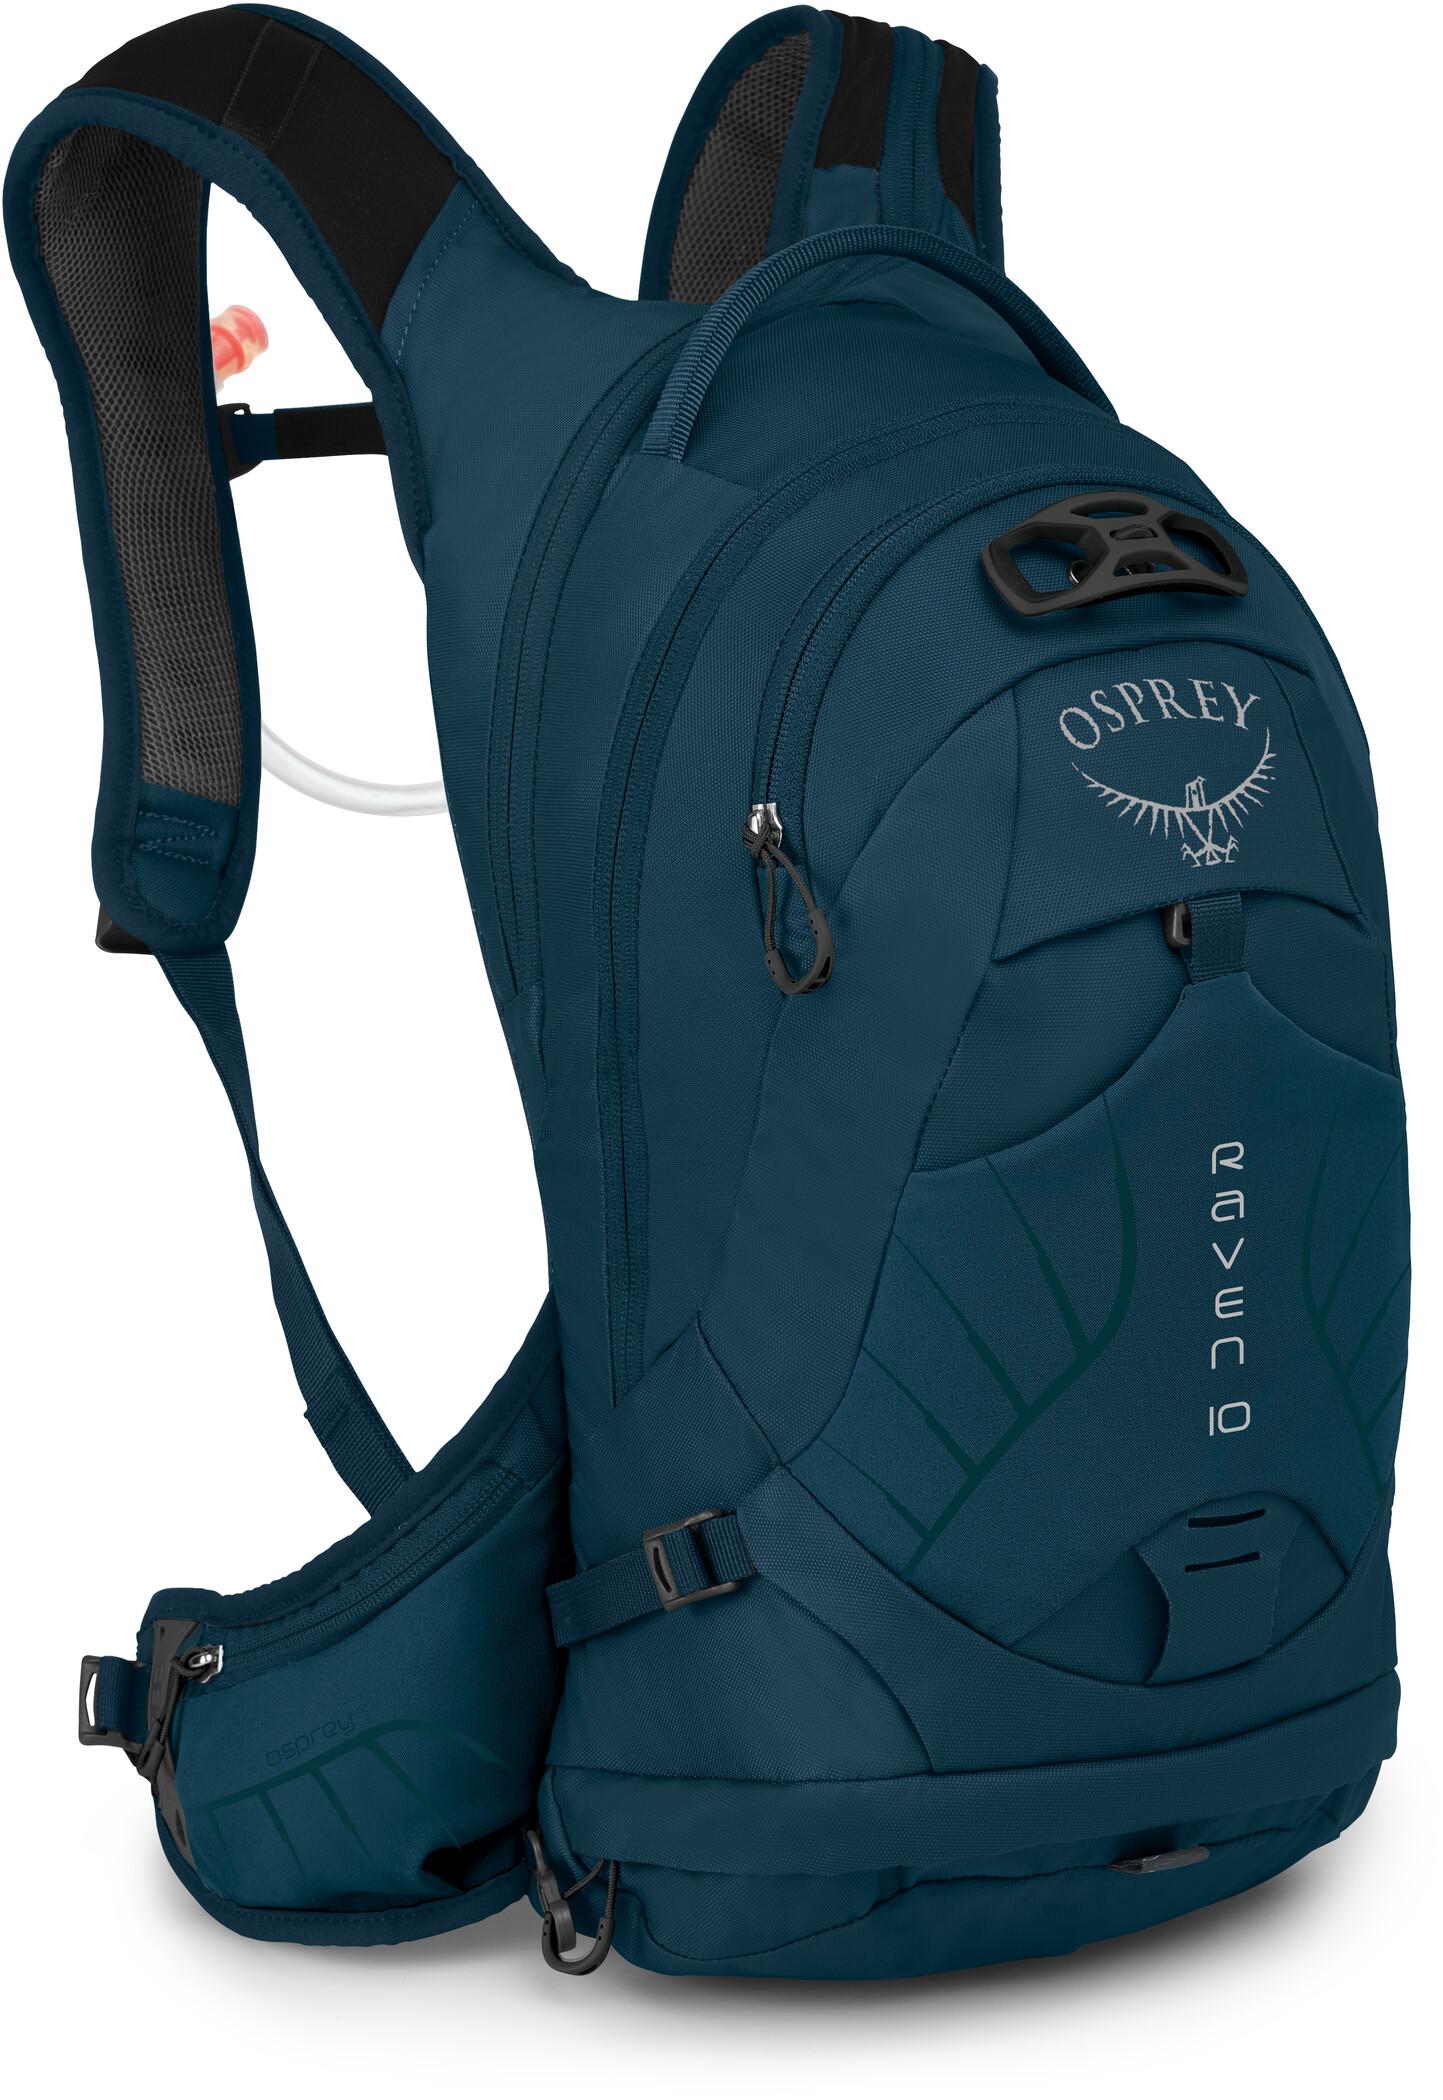 Osprey Raven 10 Rygsæk Damer, blue emerald (2020) | Travel bags